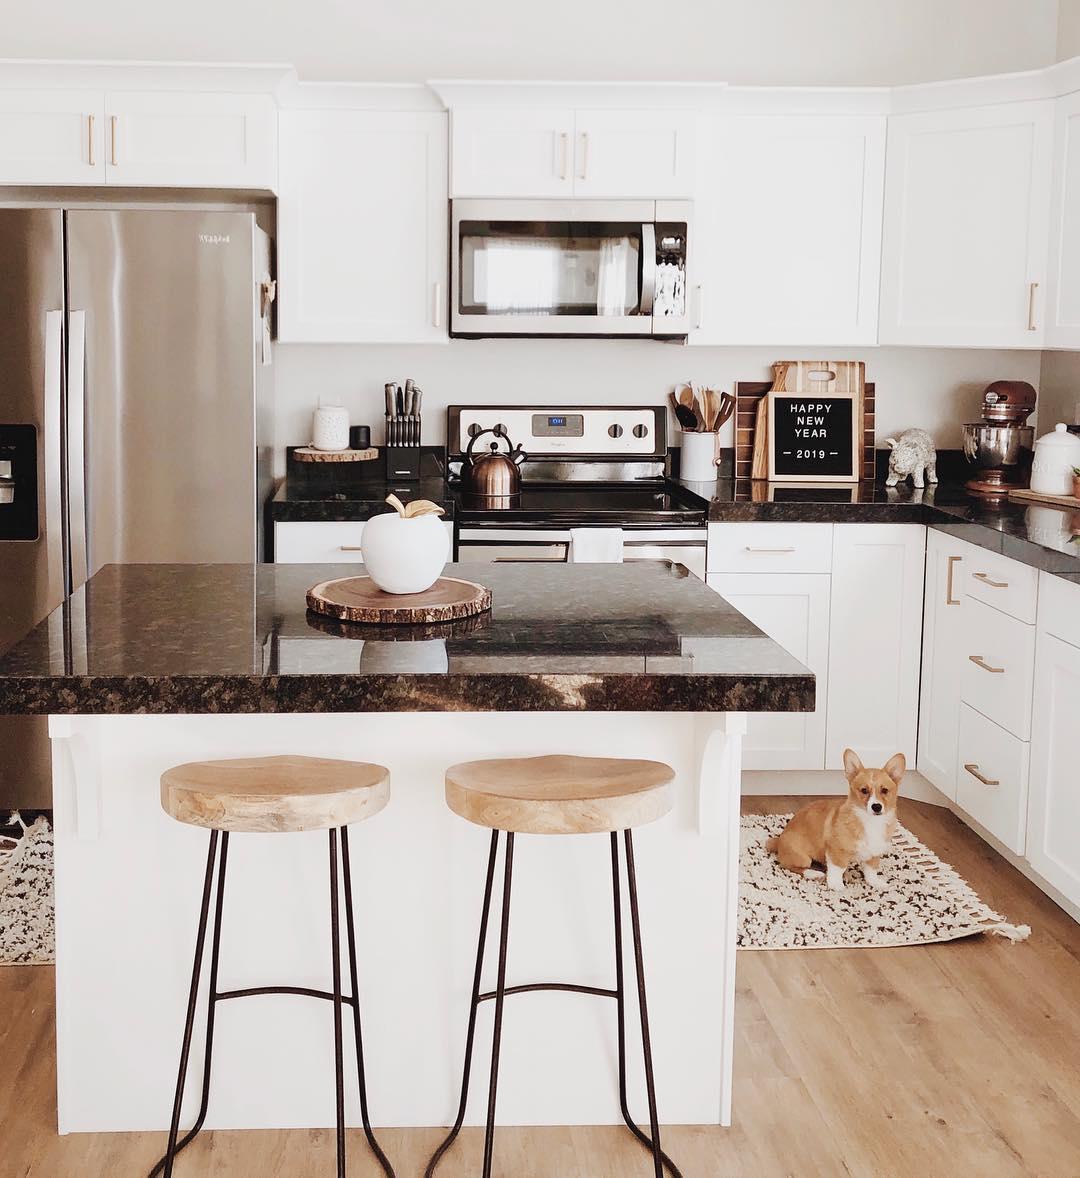 30-most-beautiful-kitchen-decorating-ideas-2019